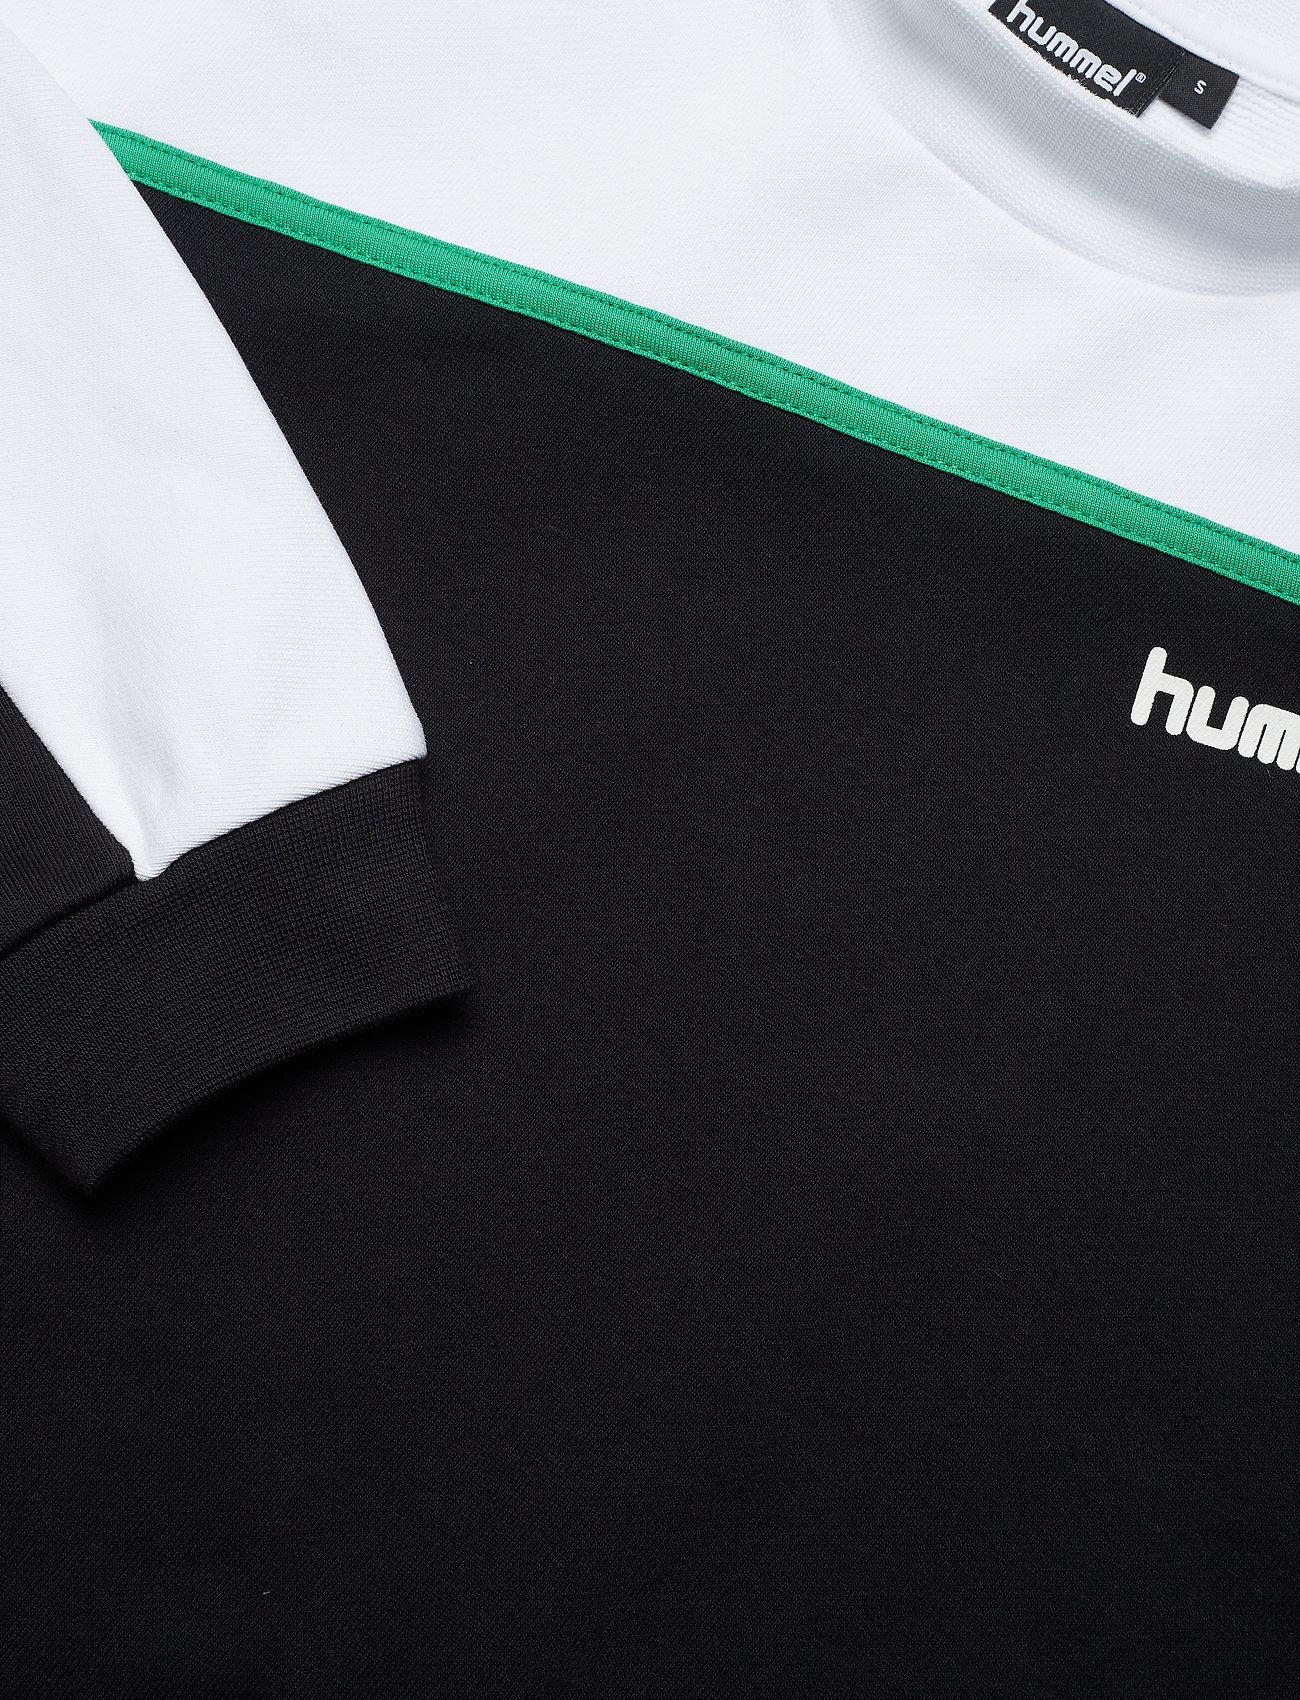 Hmlcrissy Sweathirt (Black) (390 kr) - Hummel Hive